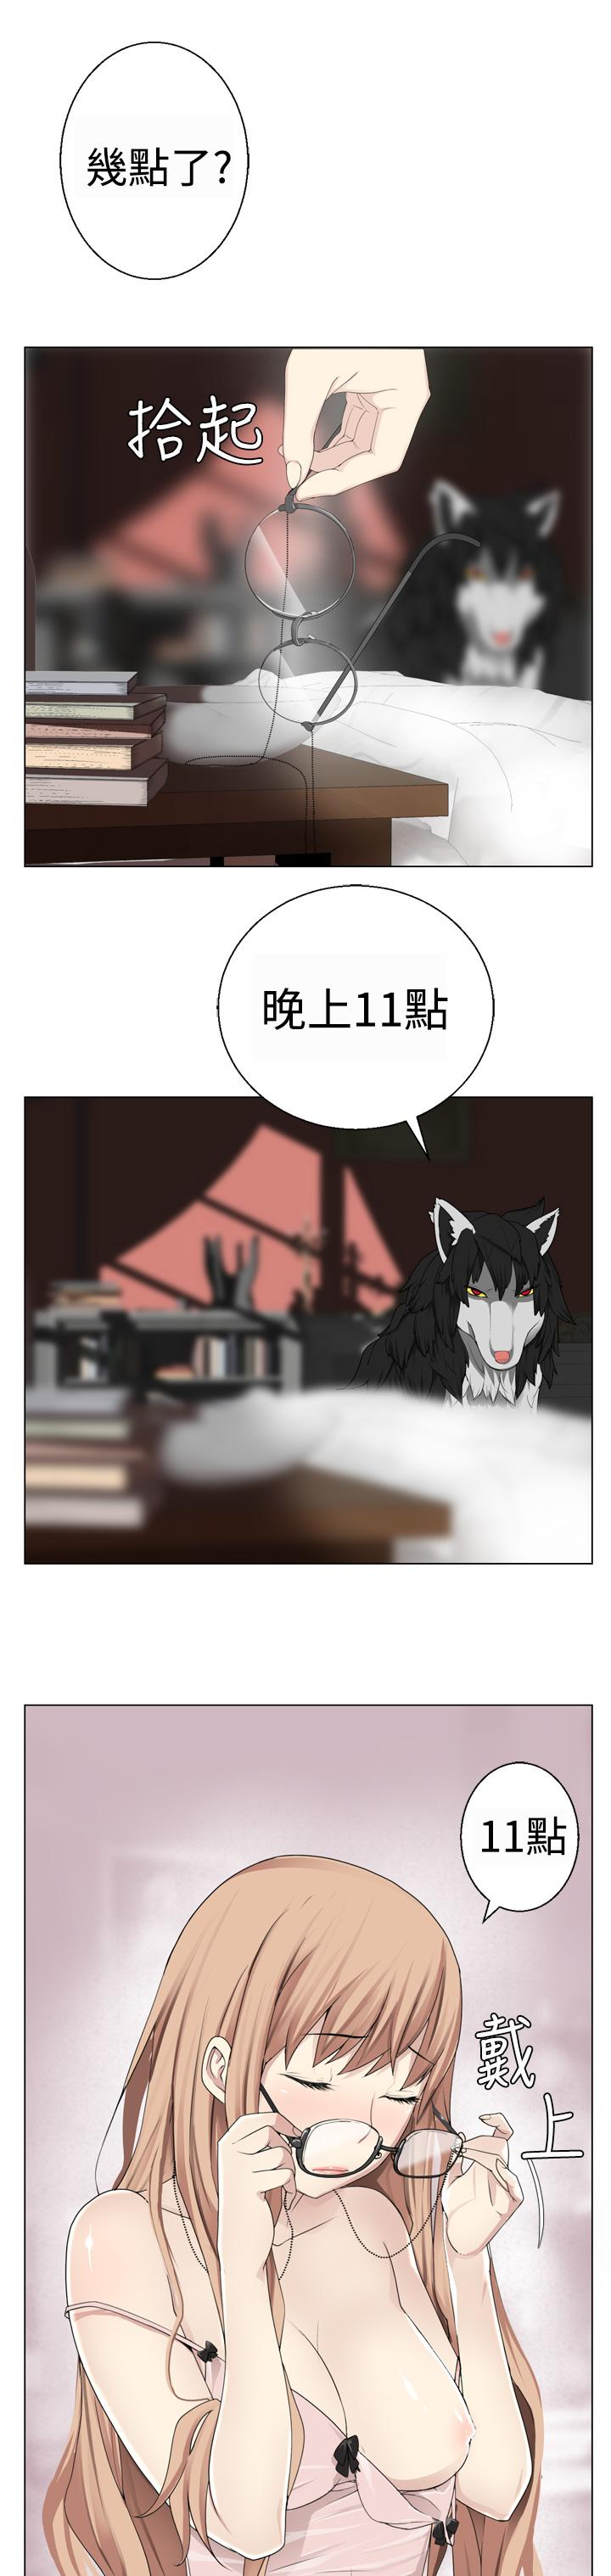 [SOSO] Franken Jo 为爱而生 法兰克赵 Ch.1~19 [Chinese]中文 178